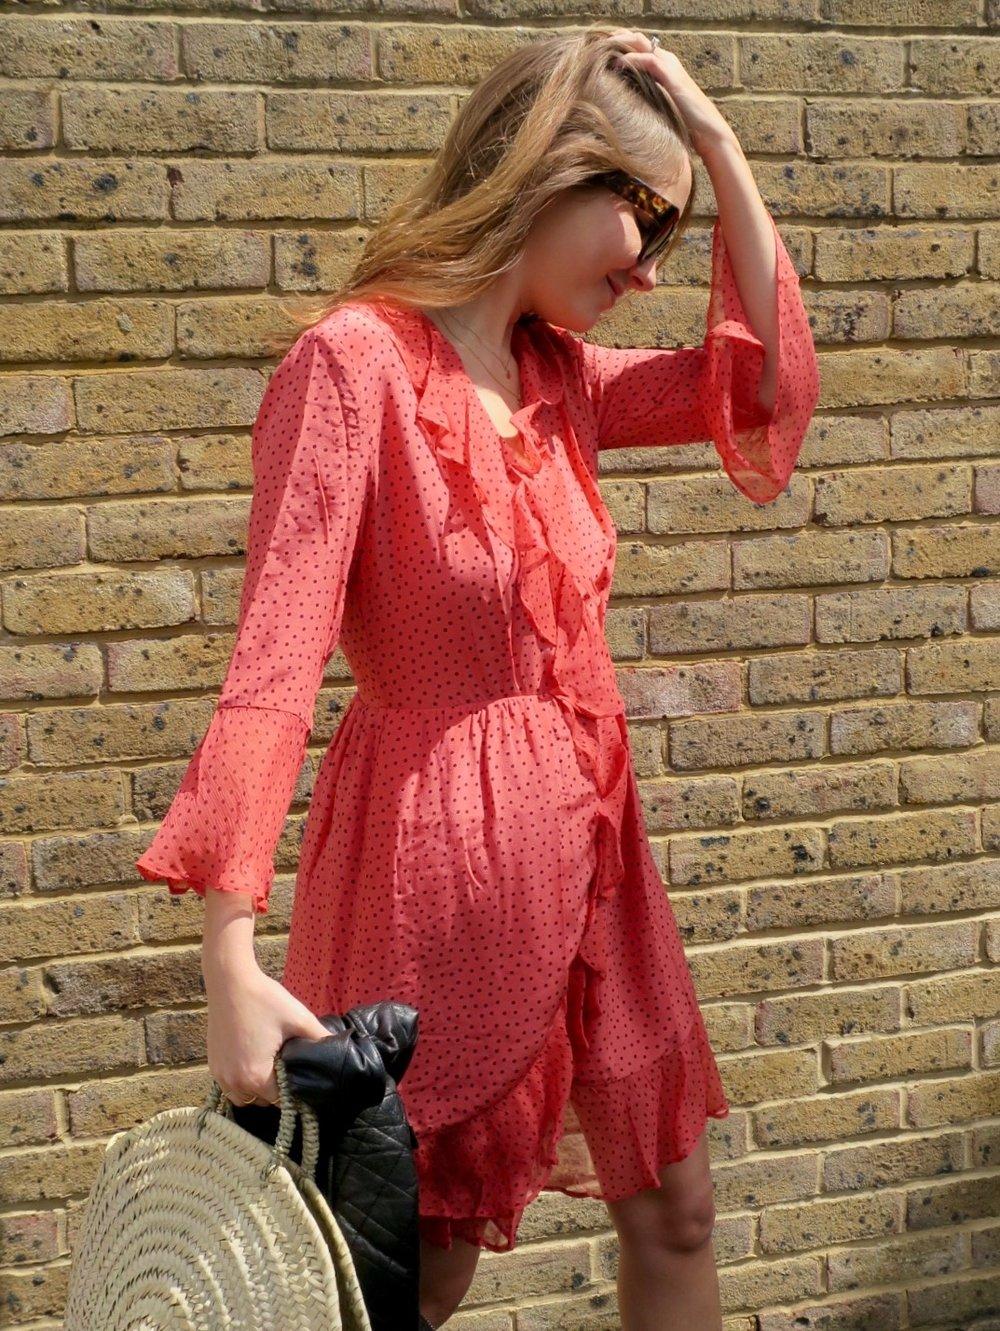 THE GROWN UP EDIT - Red Summer Dress